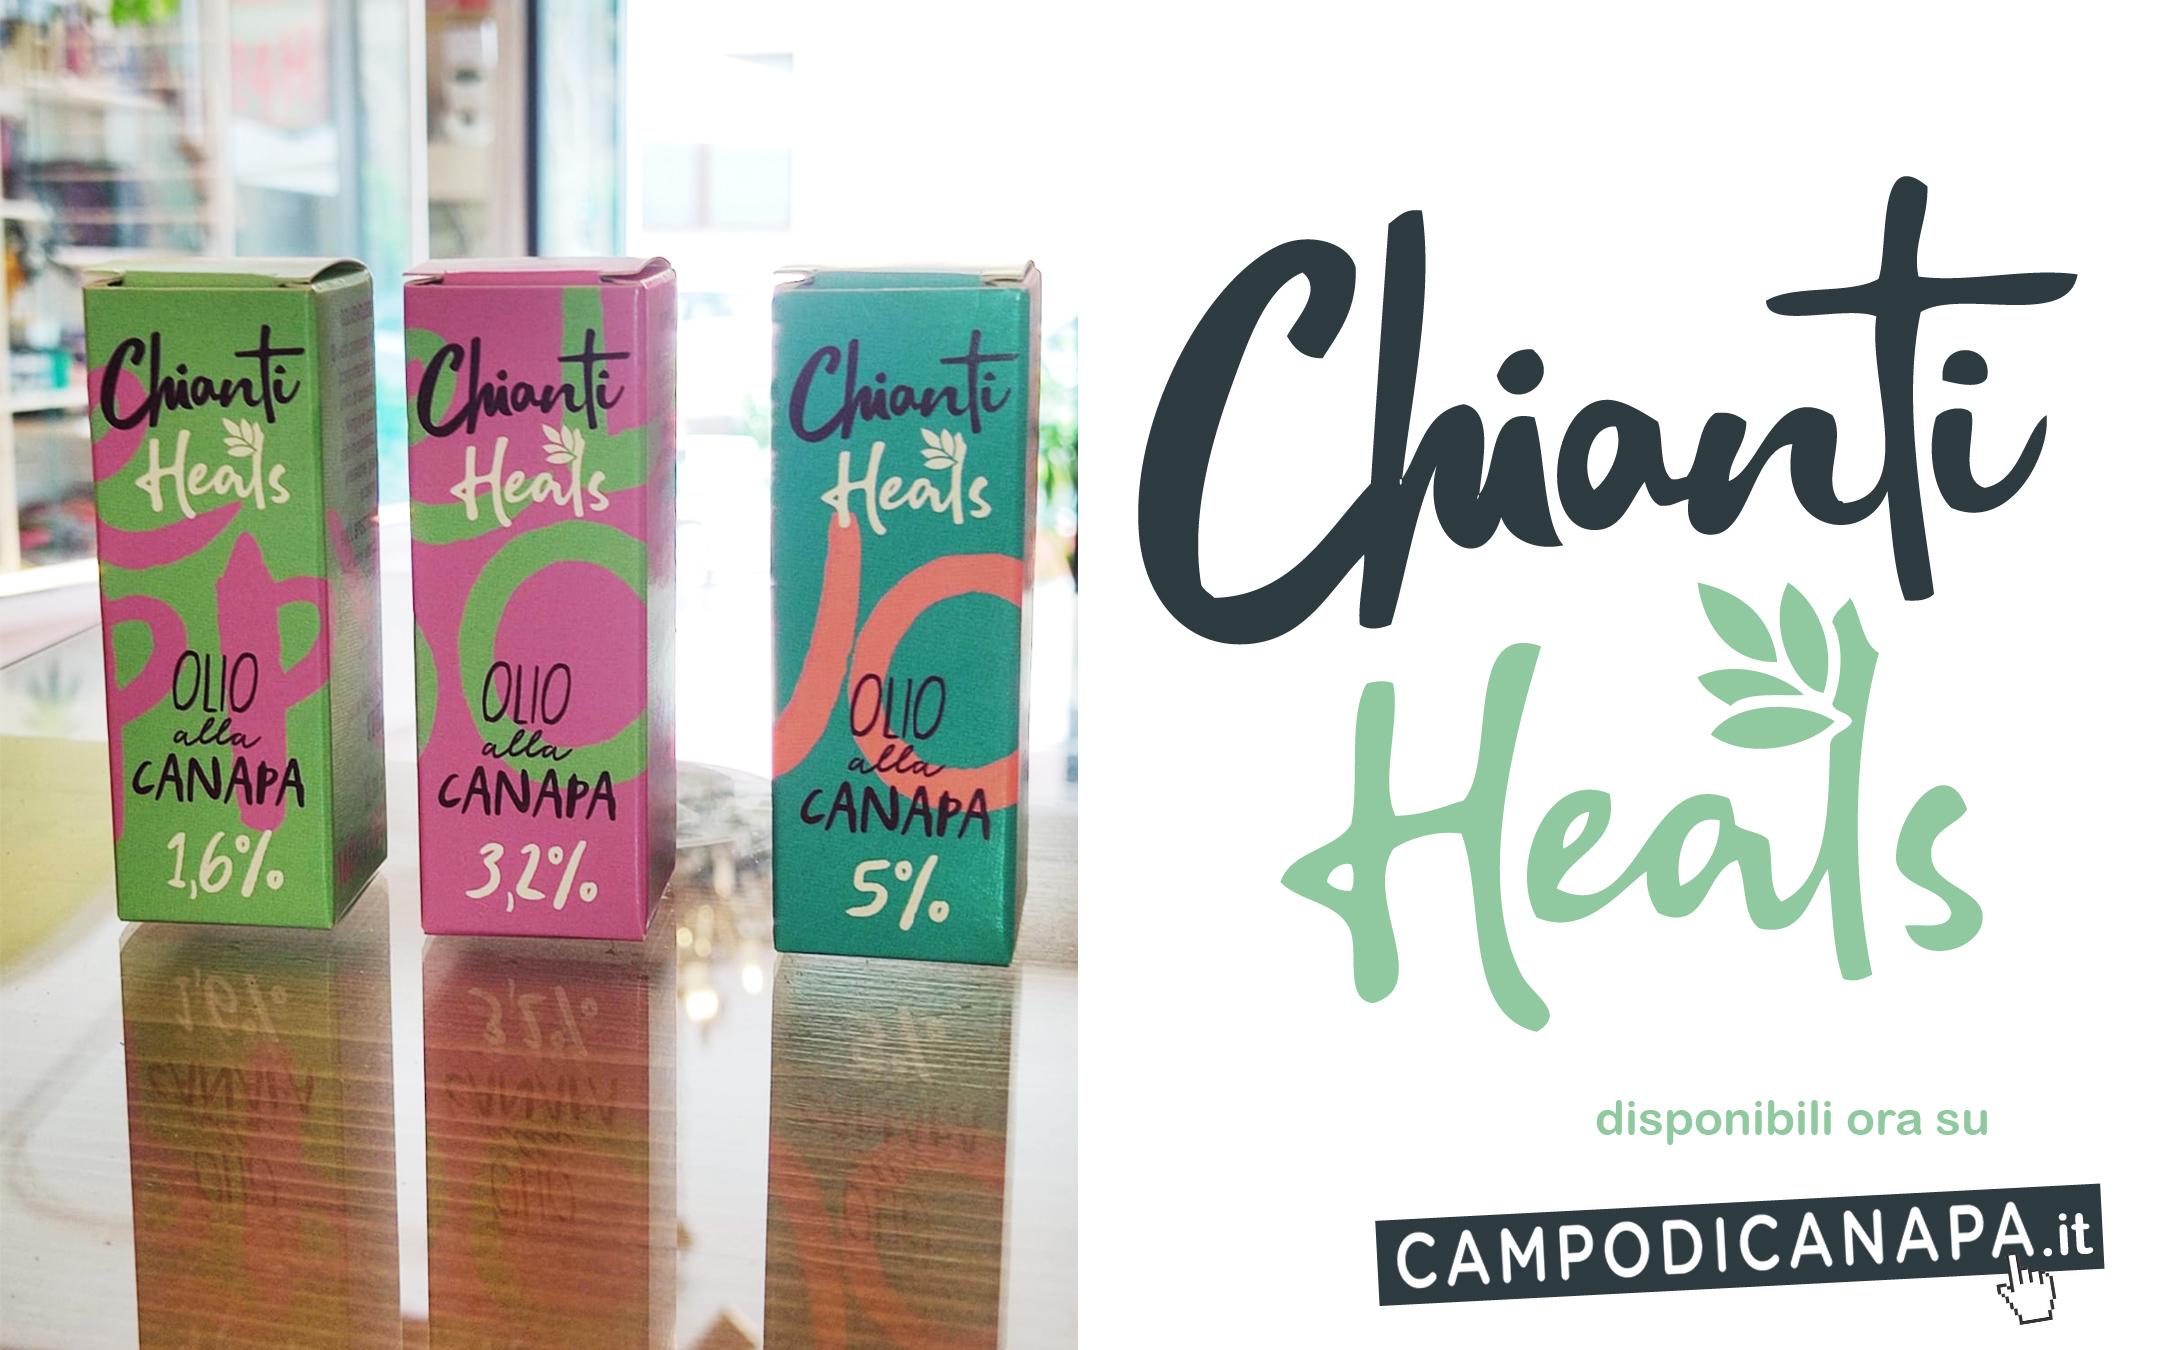 Chianti Heals - olio cannabis